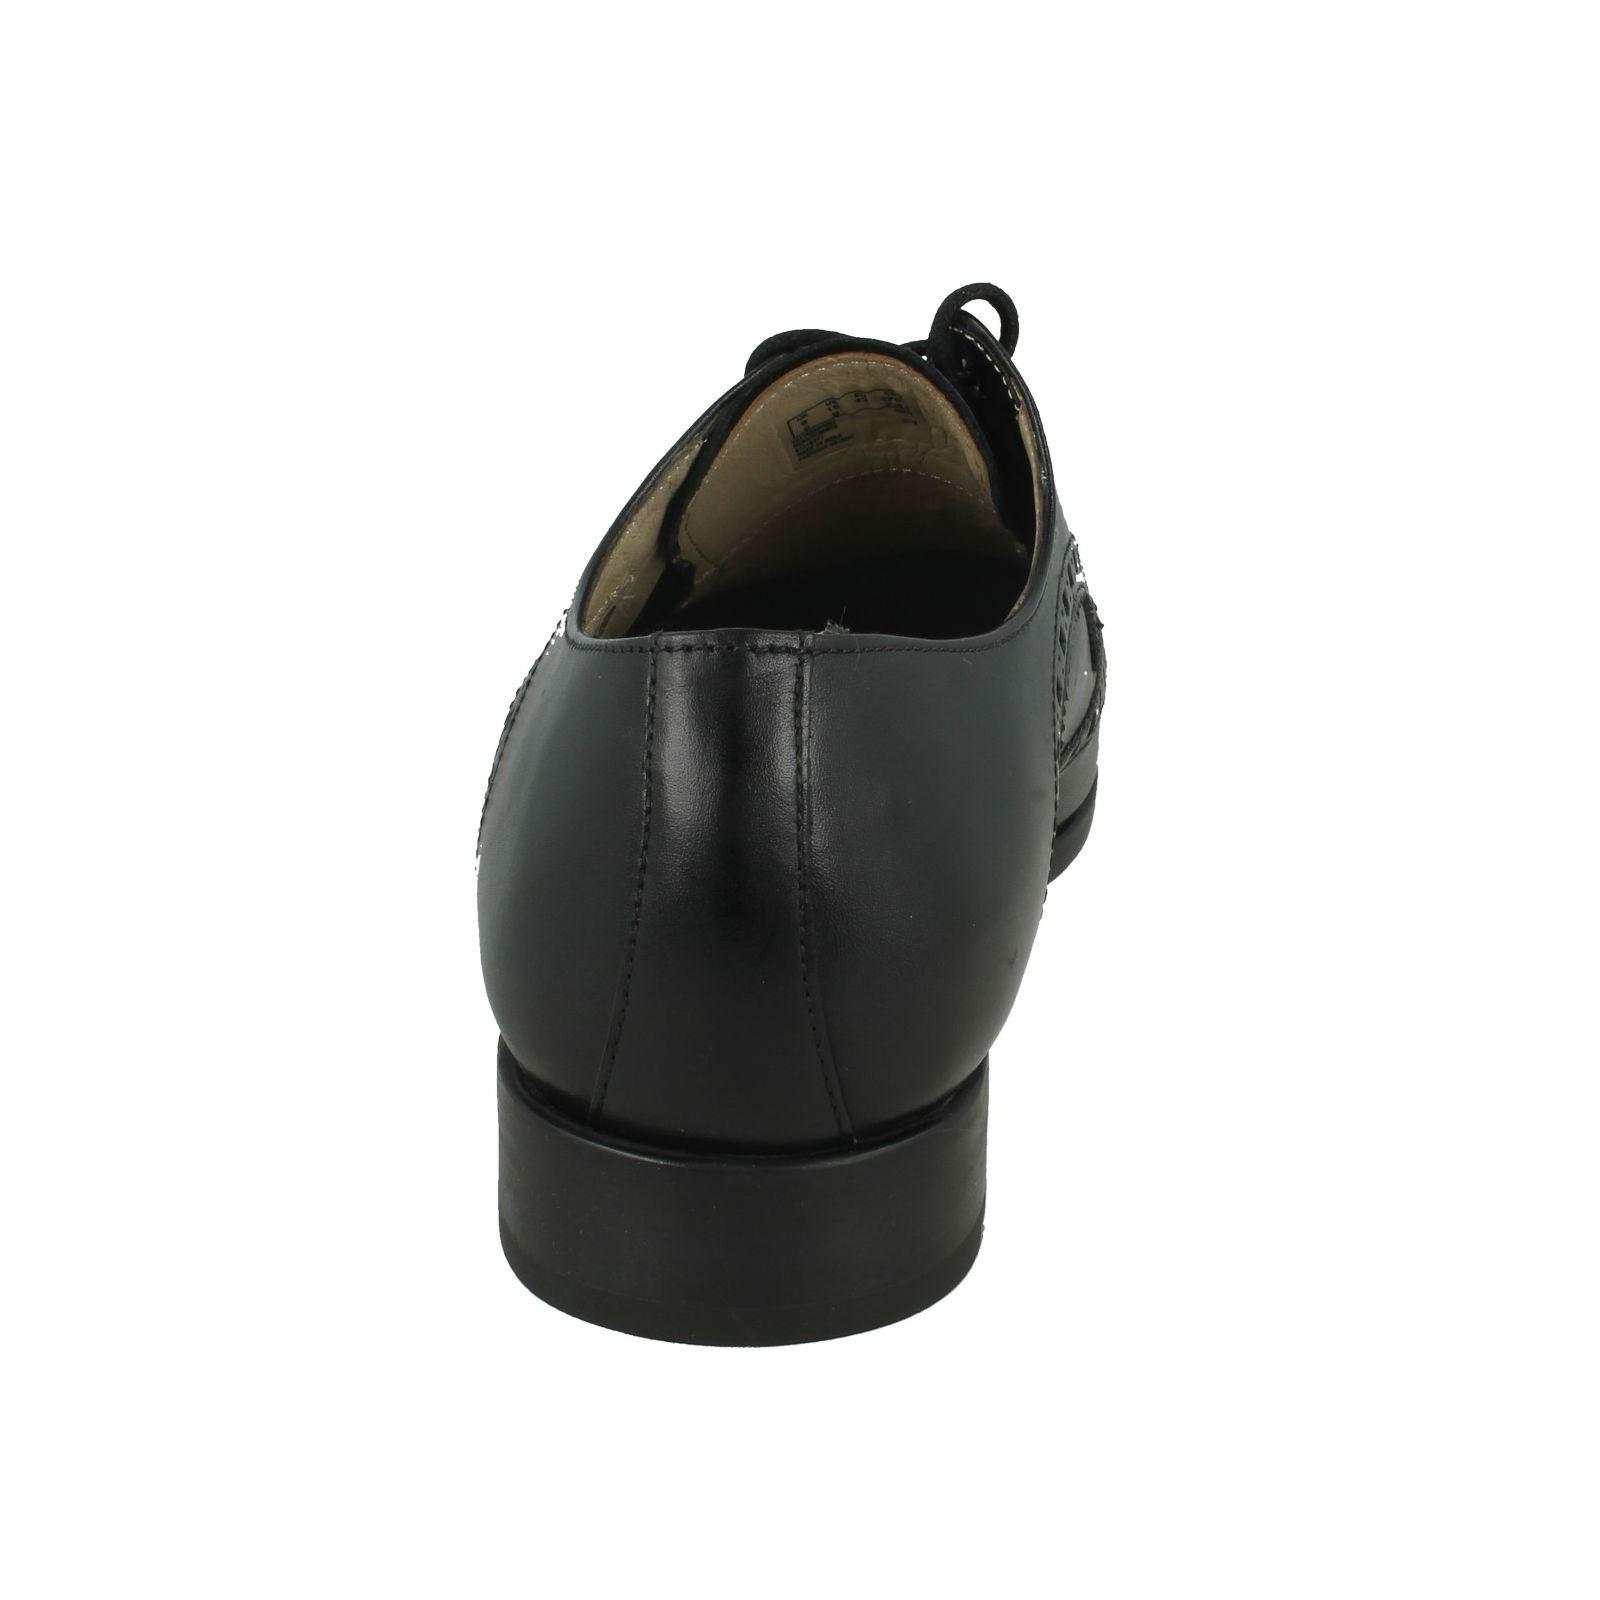 Uomo Leder Clarks Lace Up Formal Leder Uomo Schuhes Style - Amieson Limit 5f8ca9